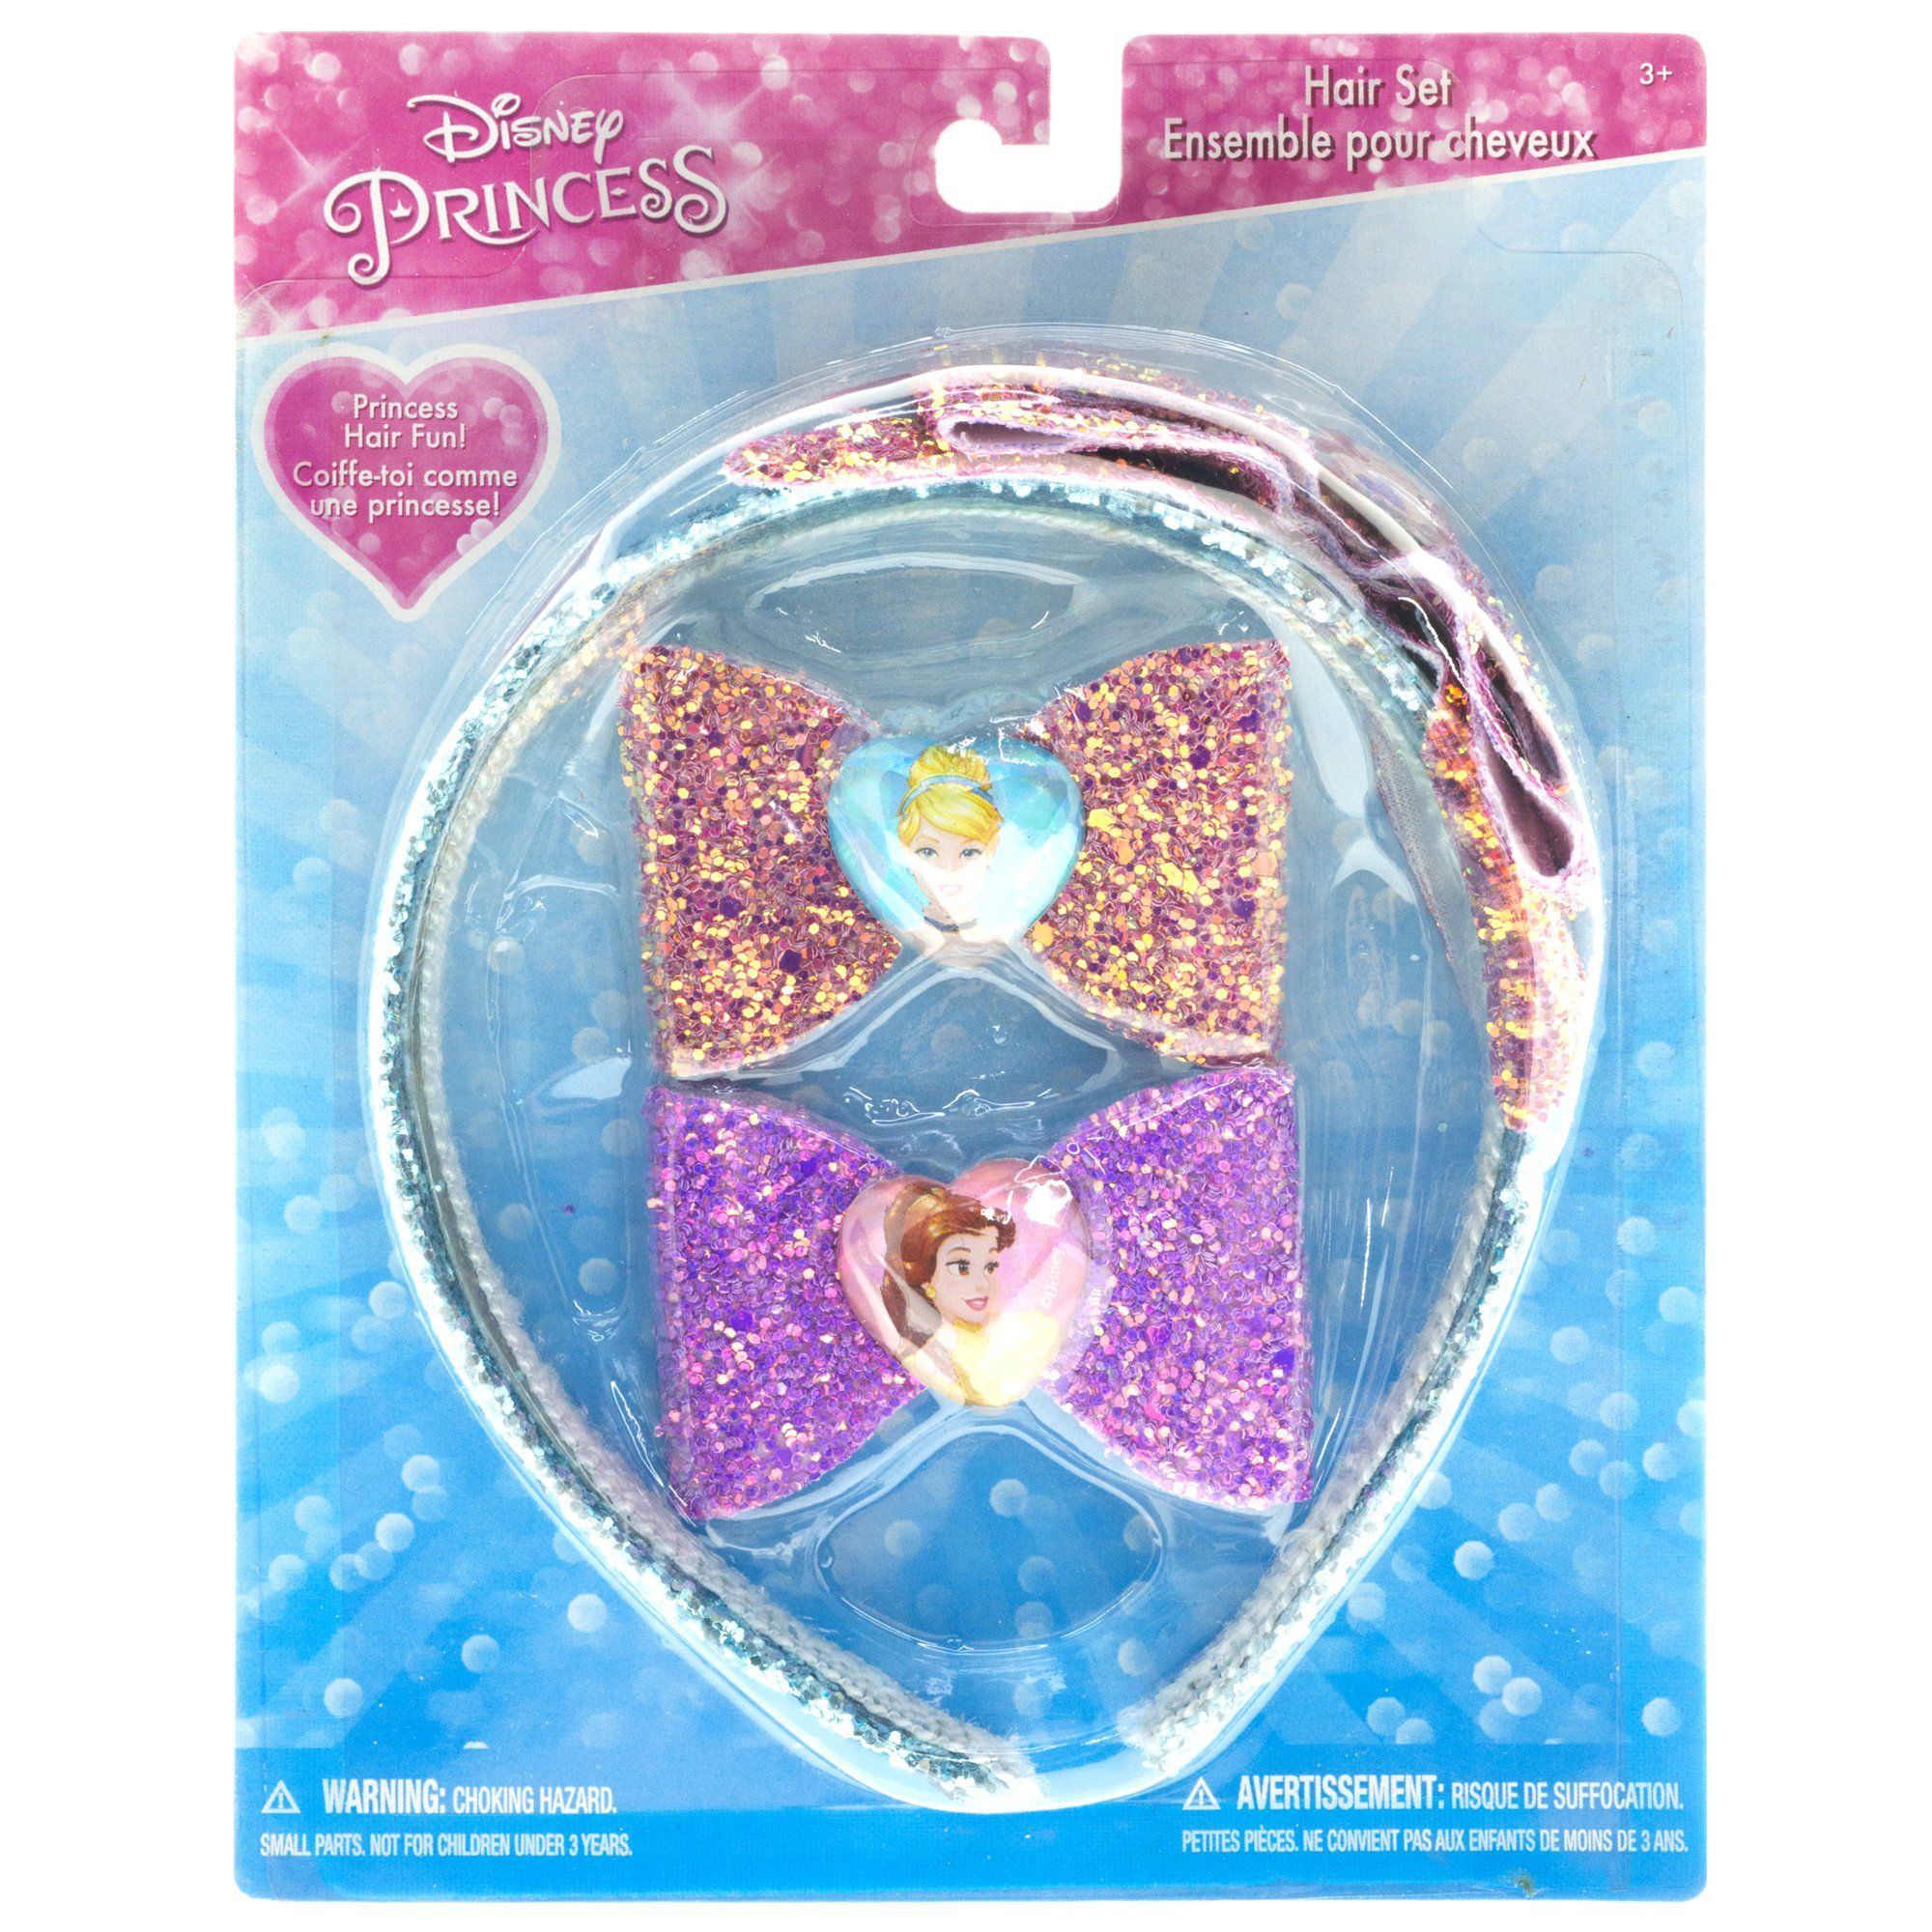 Disney princess hair accessories set products